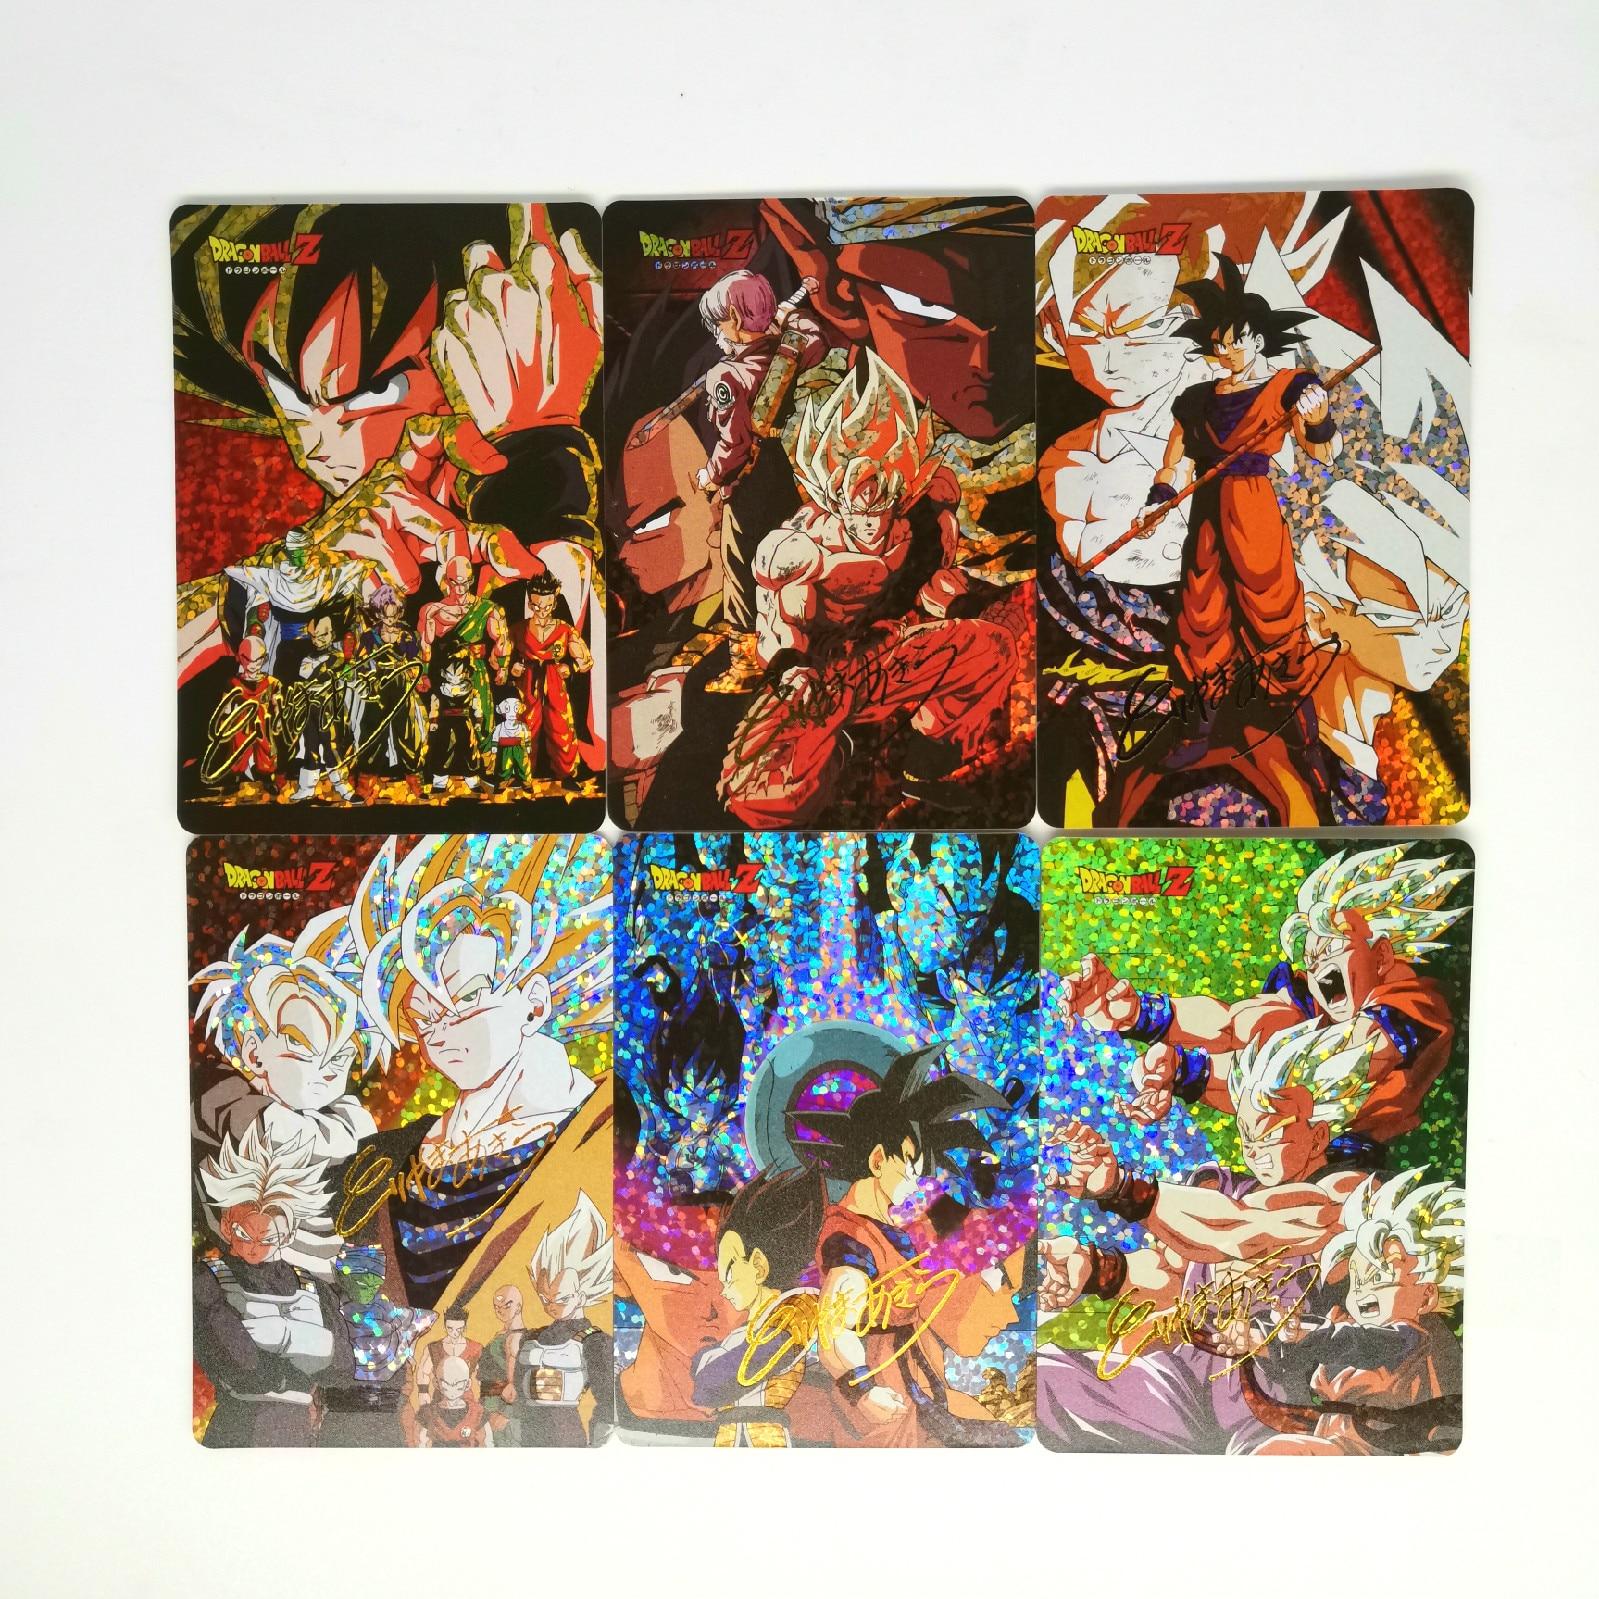 9pcs Super Dragon Ball Z Toriyama Akira Signature Heroes Battle Card Ultra Instinct Goku Vegeta Game Collection Cards